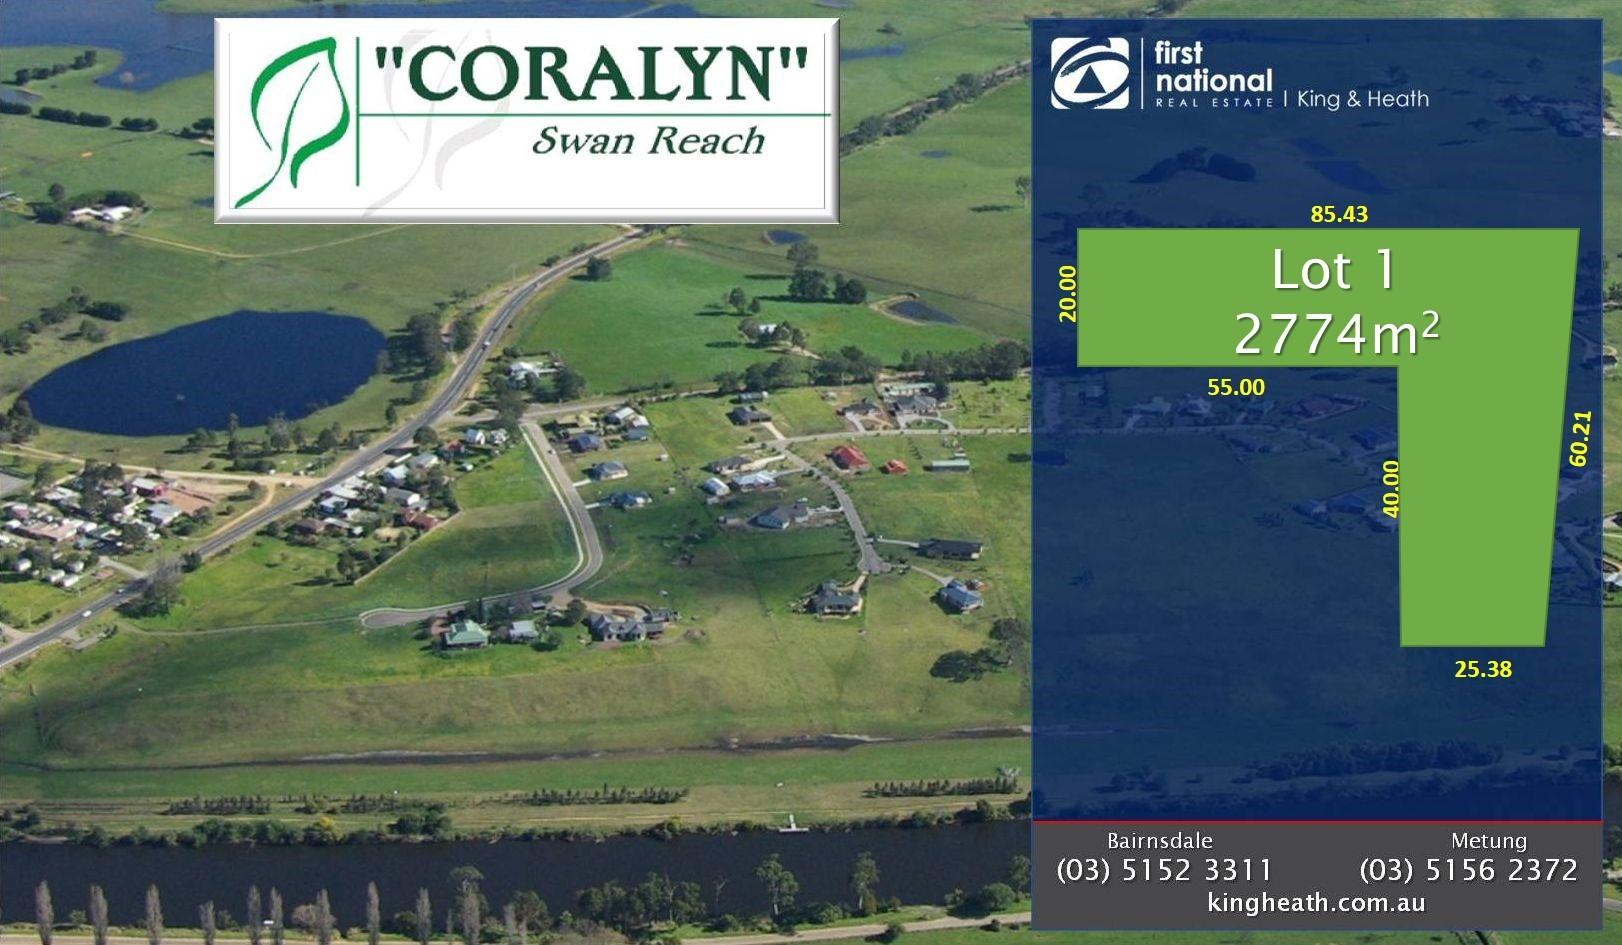 Lot 1 Coralyn Drive, Swan Reach VIC 3903-1